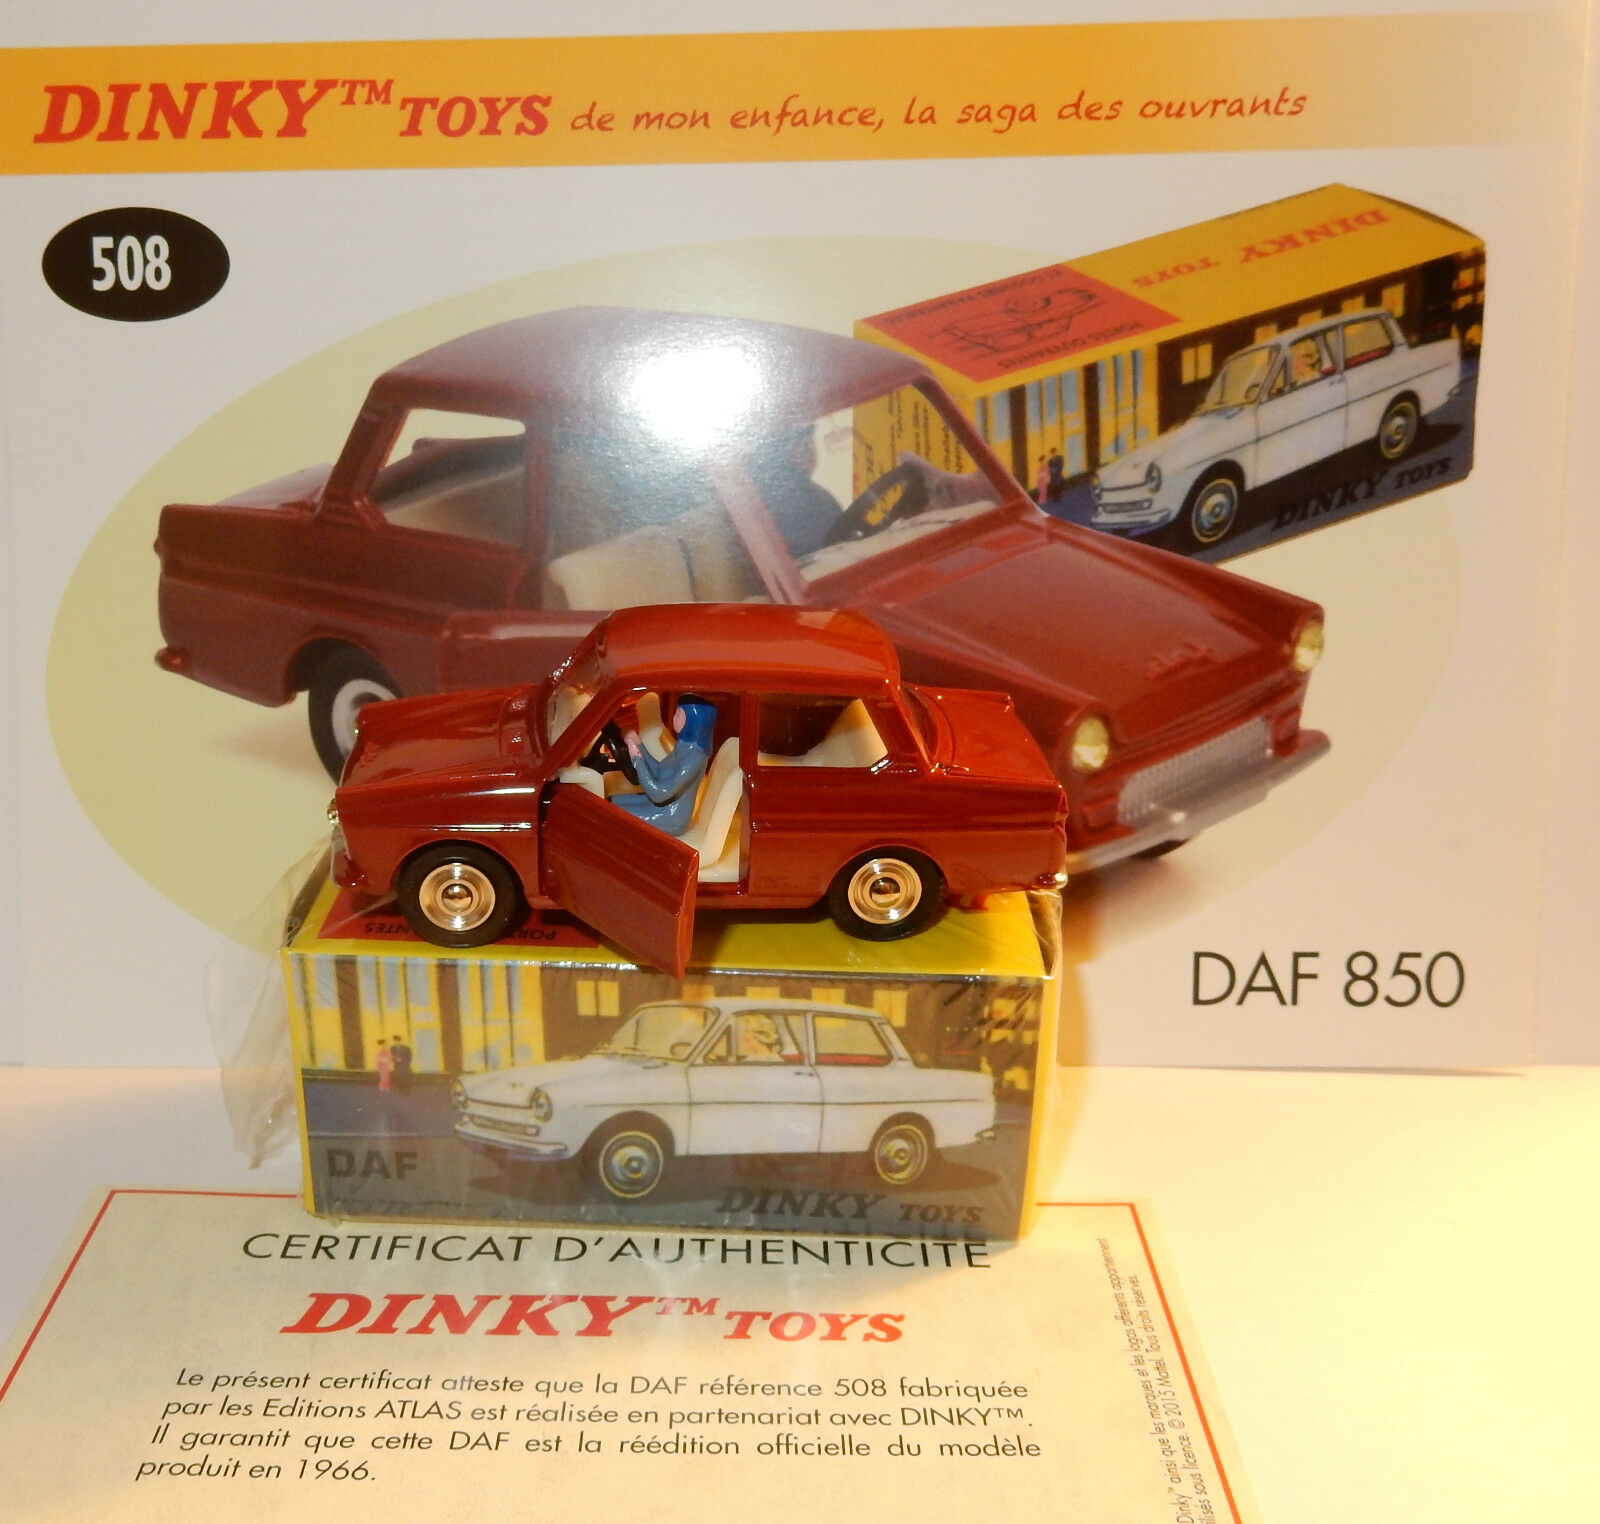 DINKY TOYS ATLAS DAF 850 BORDEAUX 1966 REF 508 PORTES OUVRANTES CONDUCTRICE 1 43